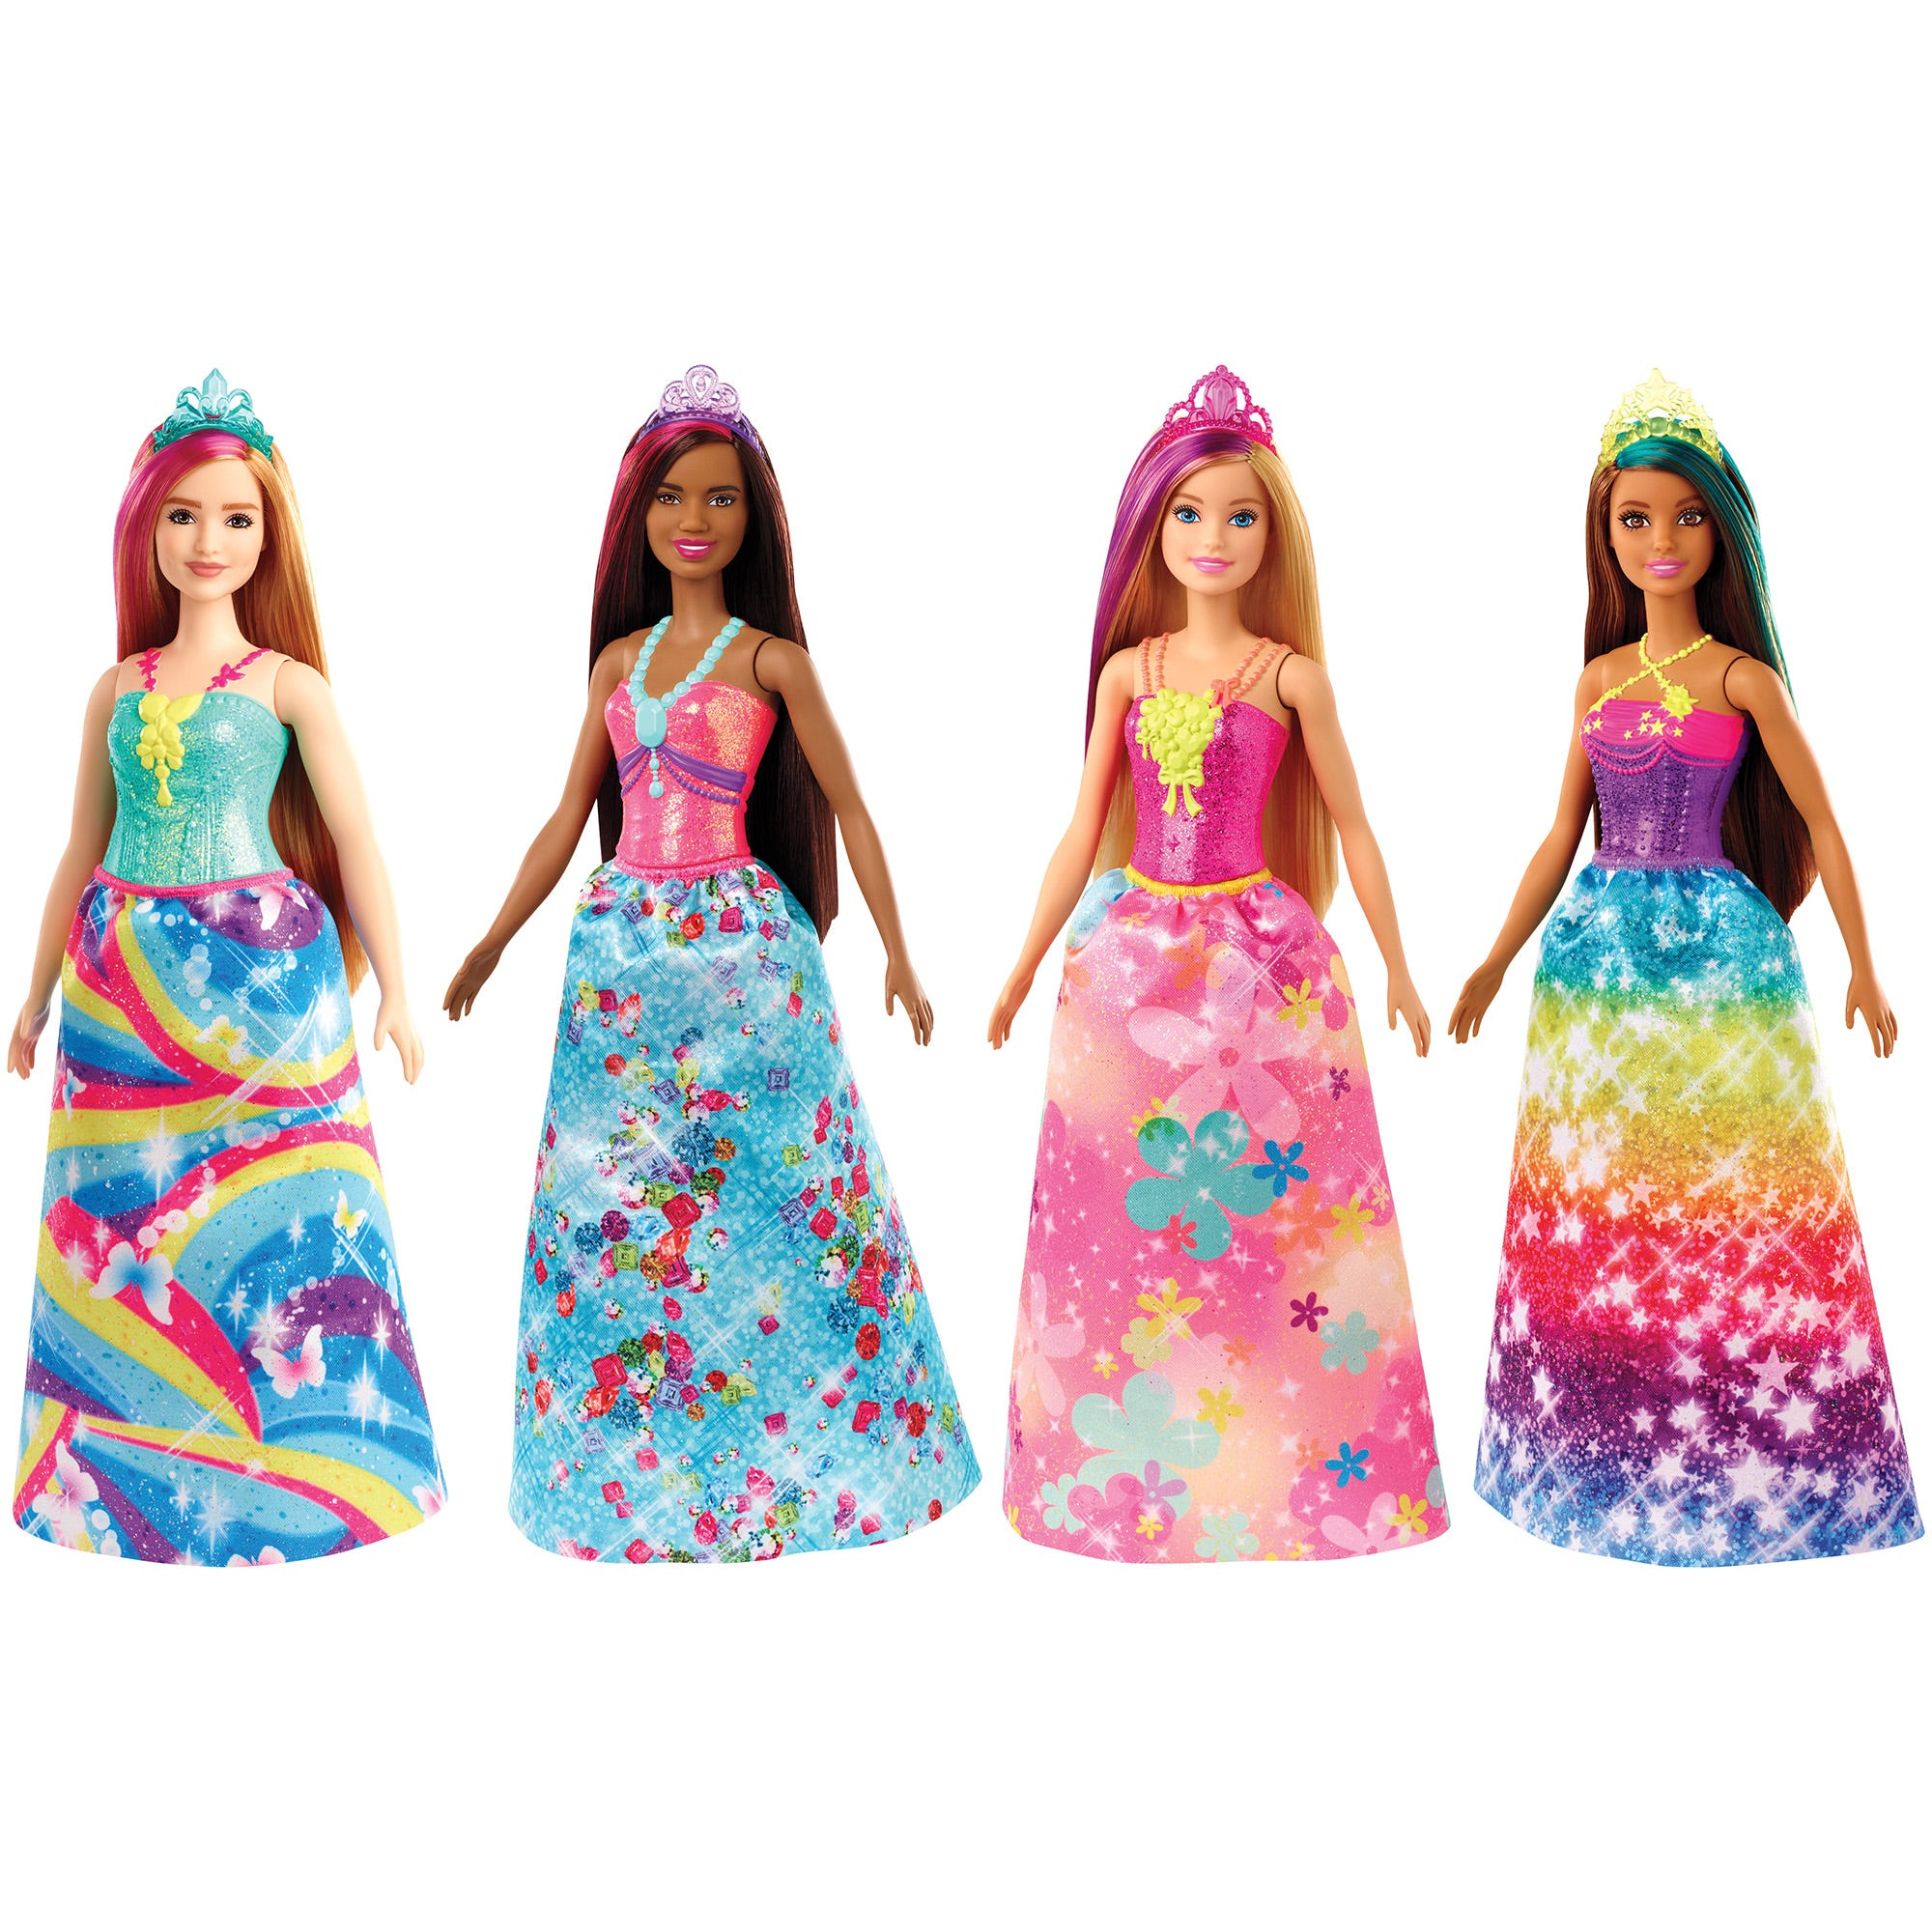 Barbie Dreamtopia Princess Doll Assortment